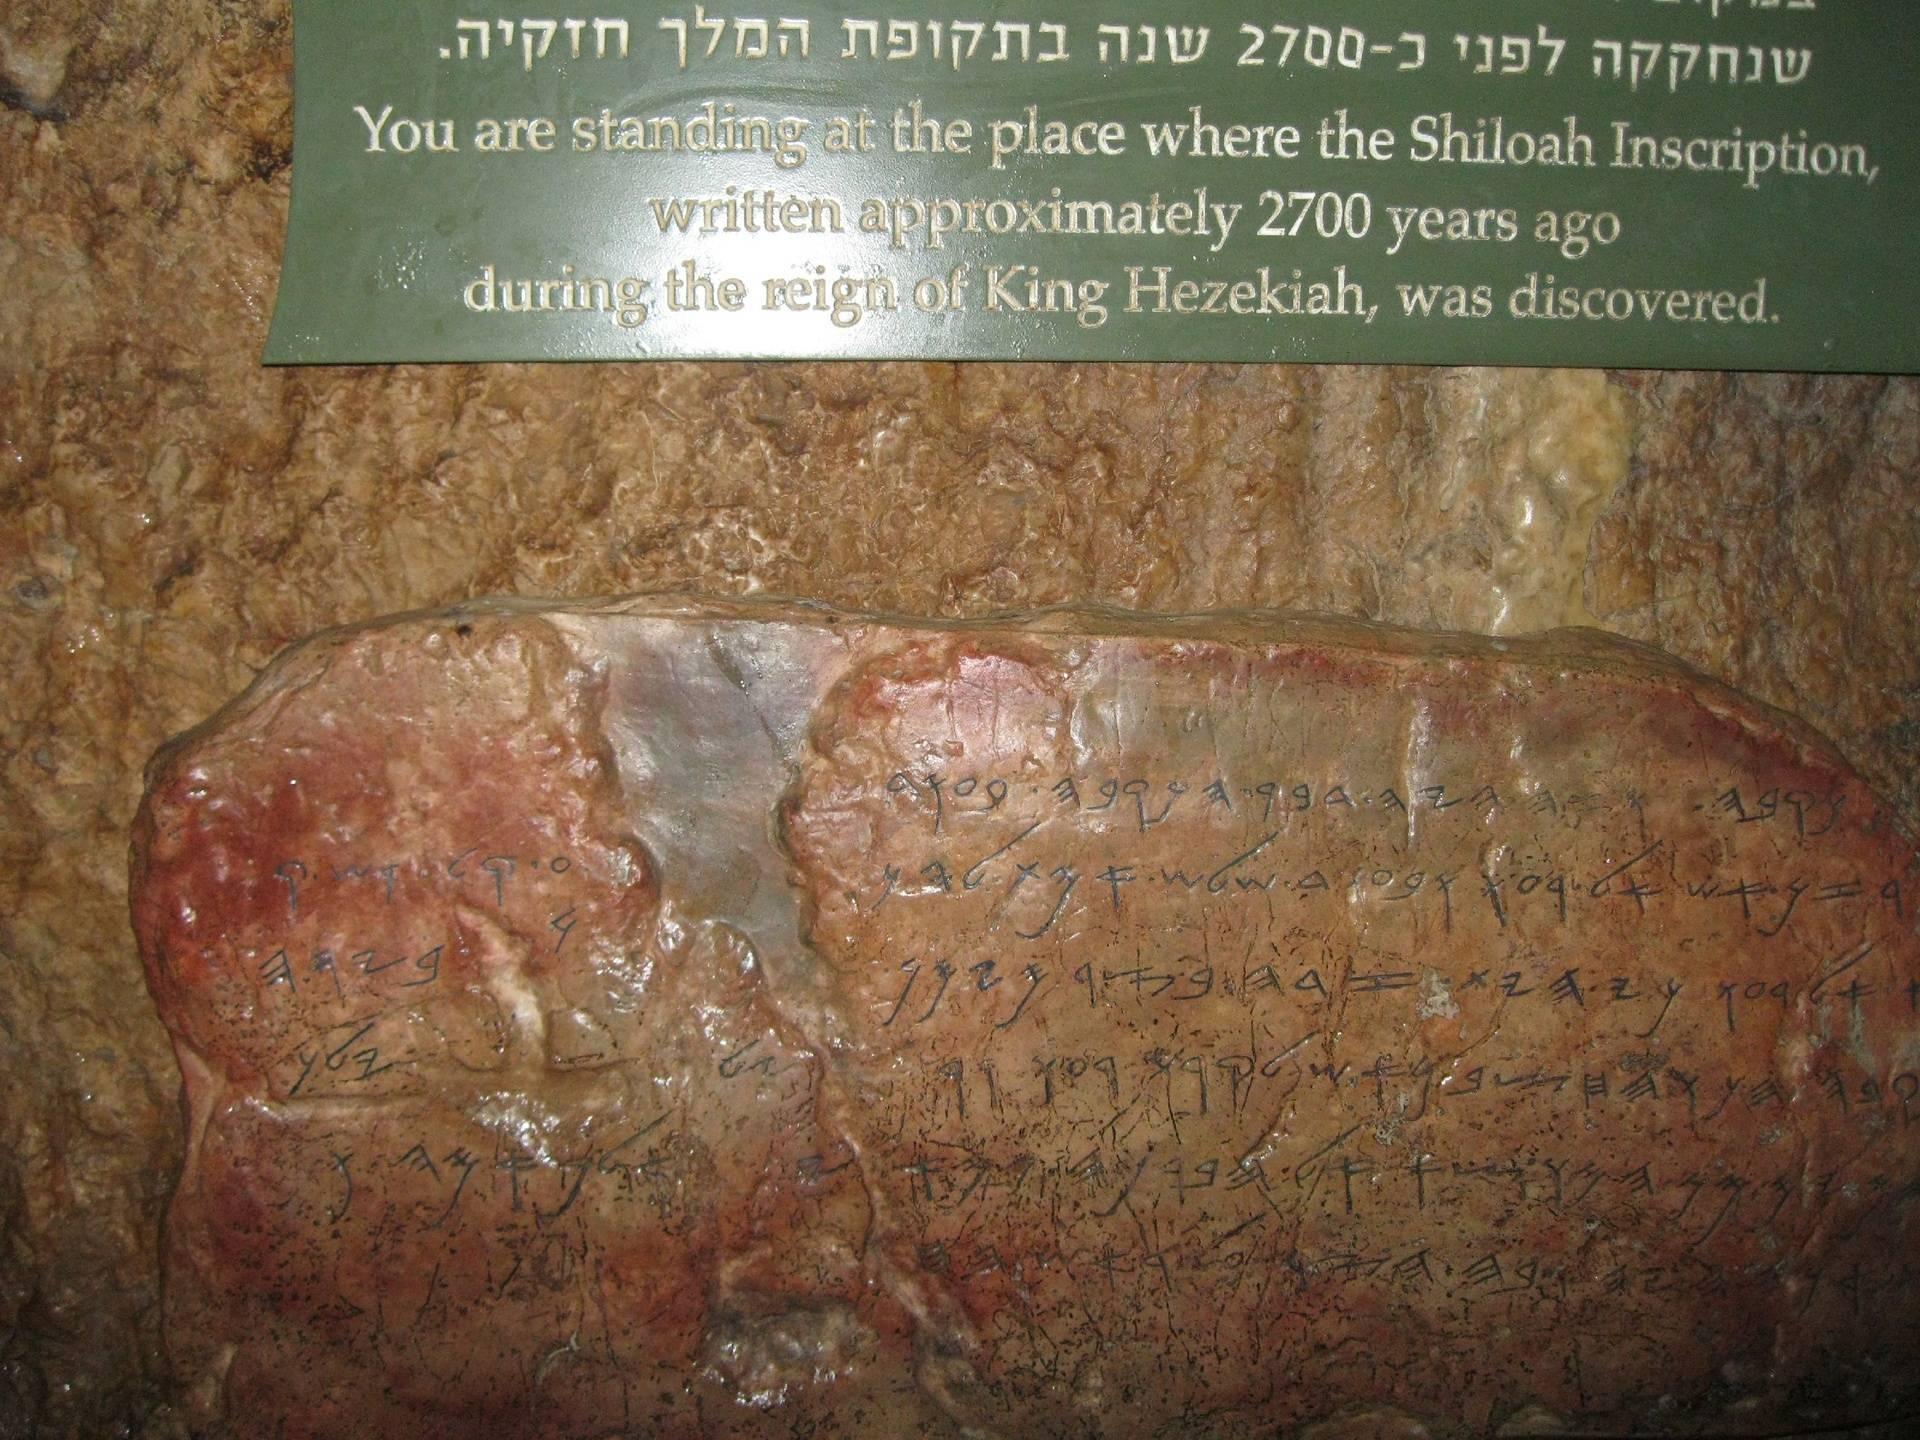 Shiloah Inscription Stone